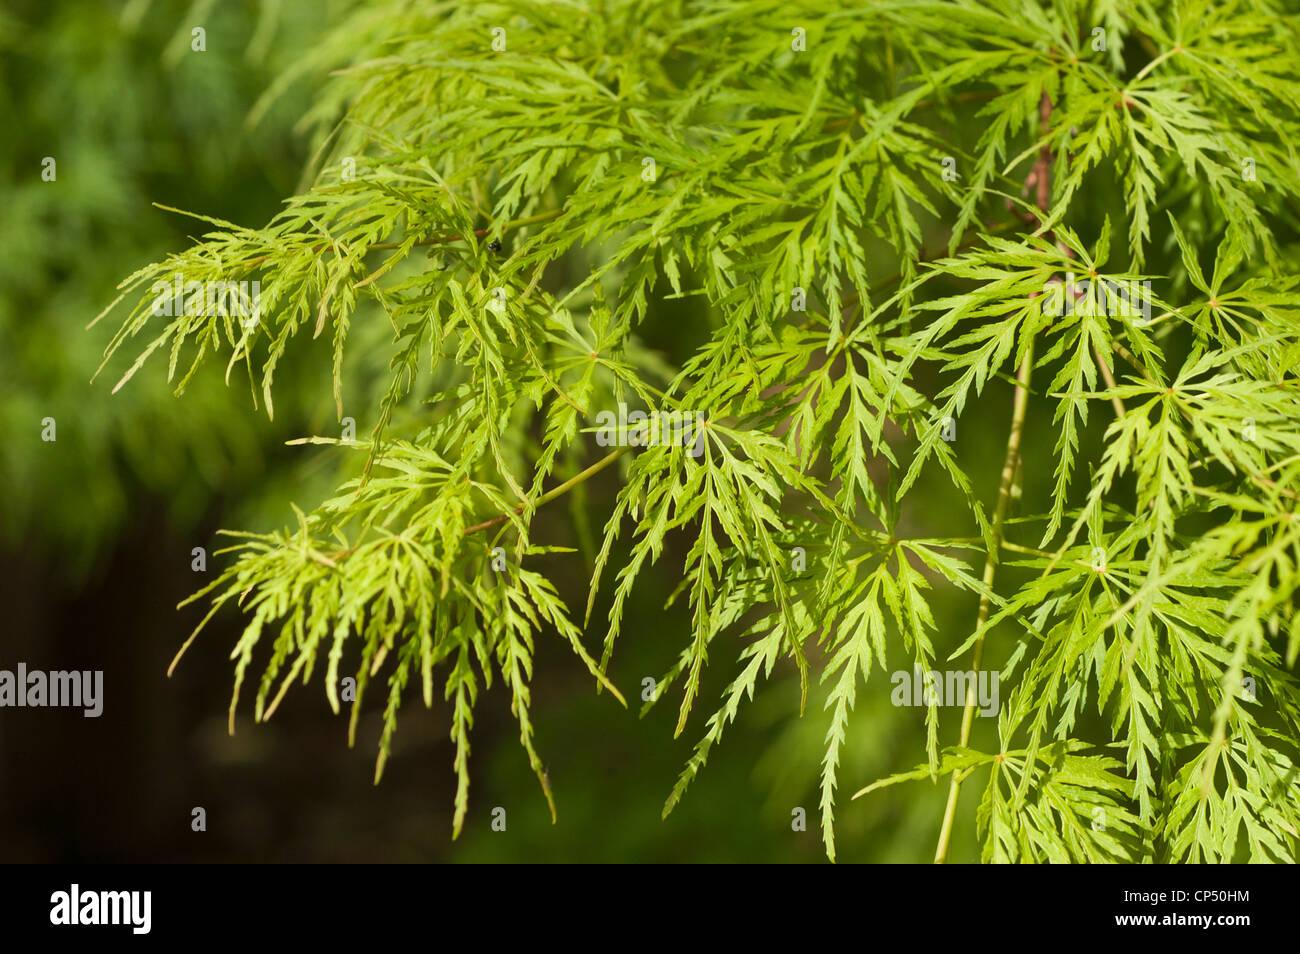 Acero Giapponese Verde verde foglie disseccate, foglie di acero giapponese, palm